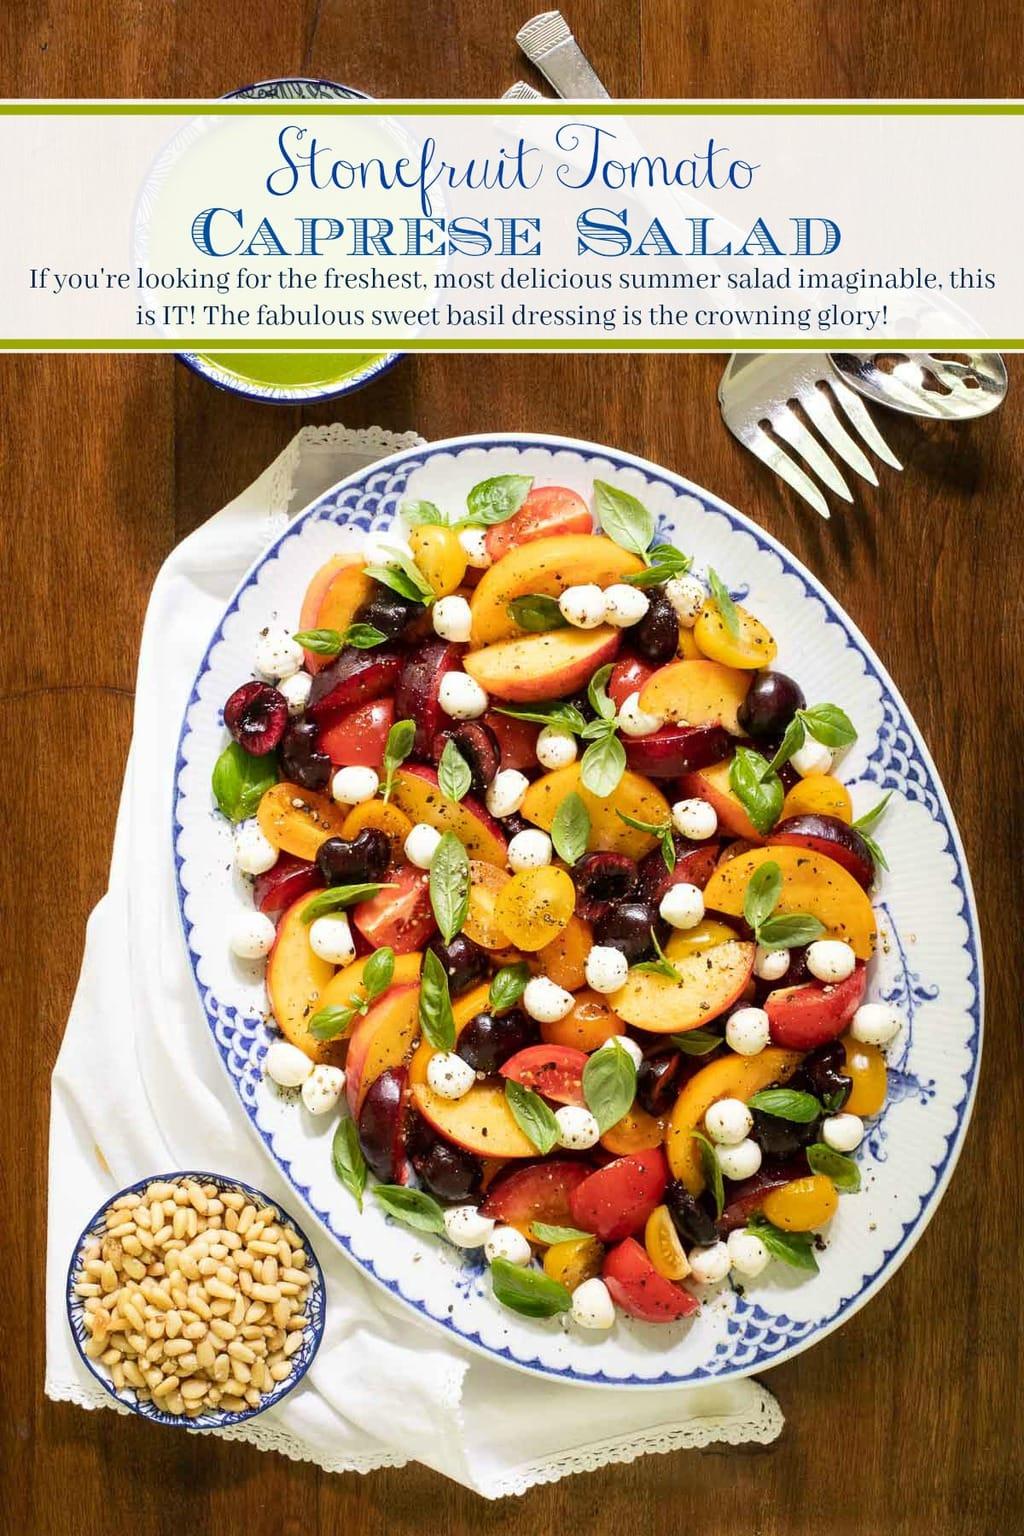 Stone Fruit Tomato Caprese Salad